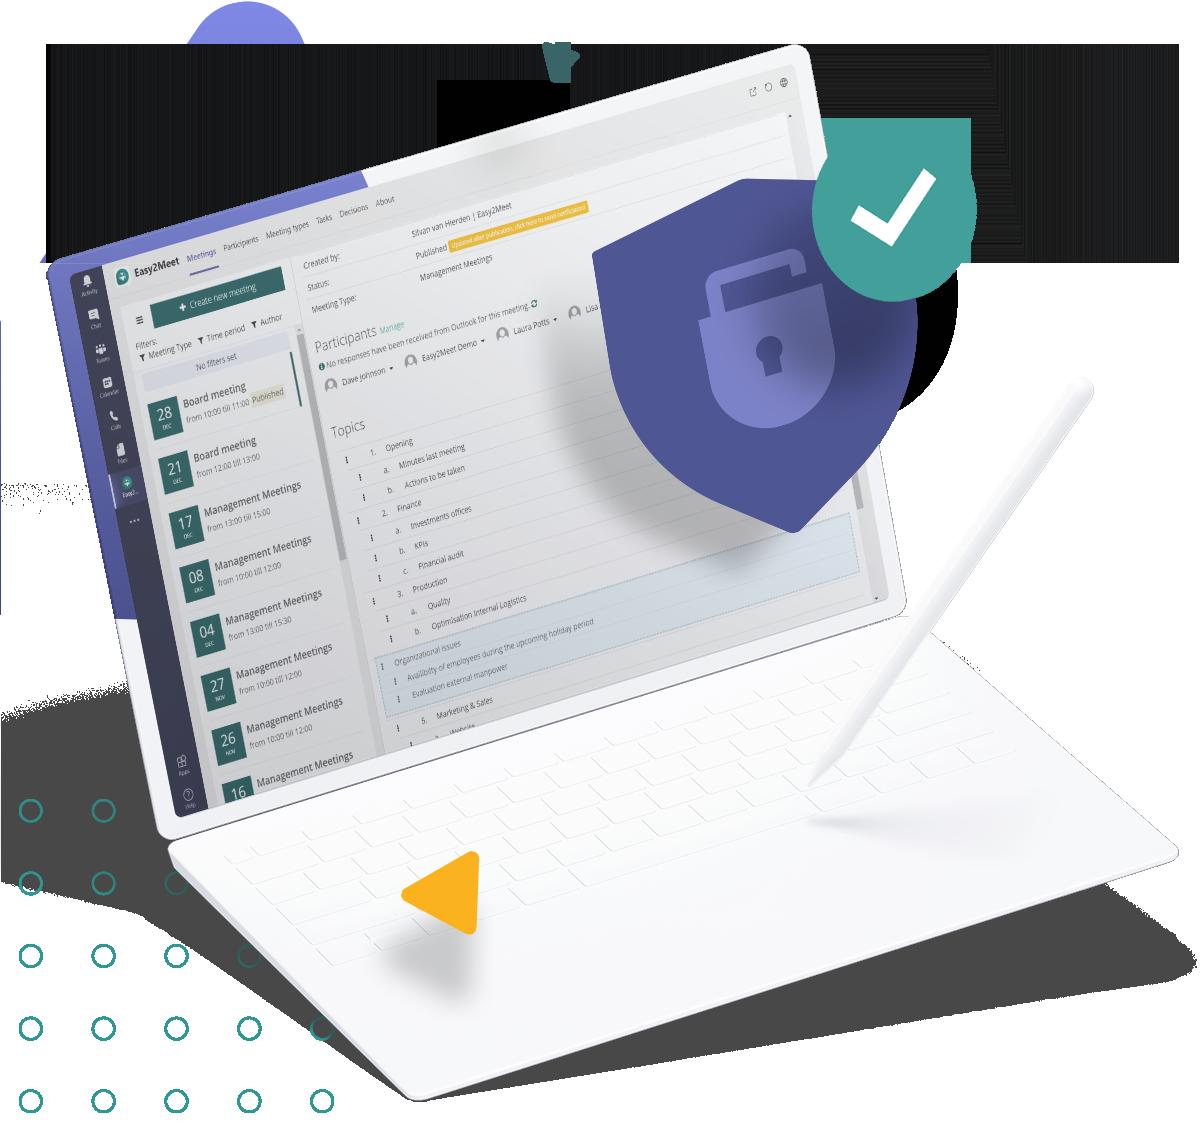 Security of Easy2Meet